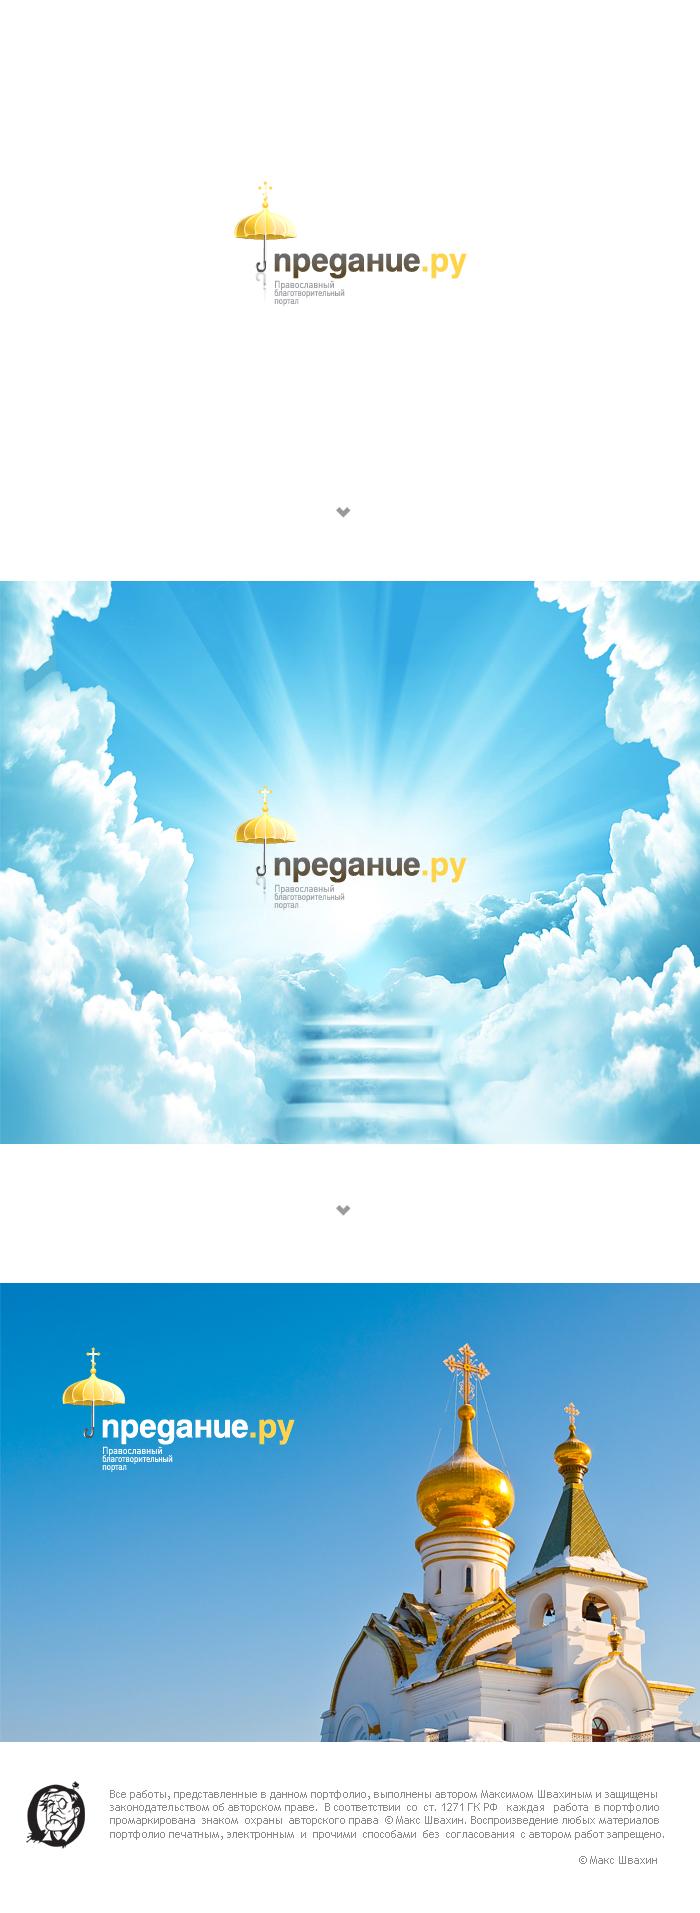 "Логотип ""Предание.ру"""